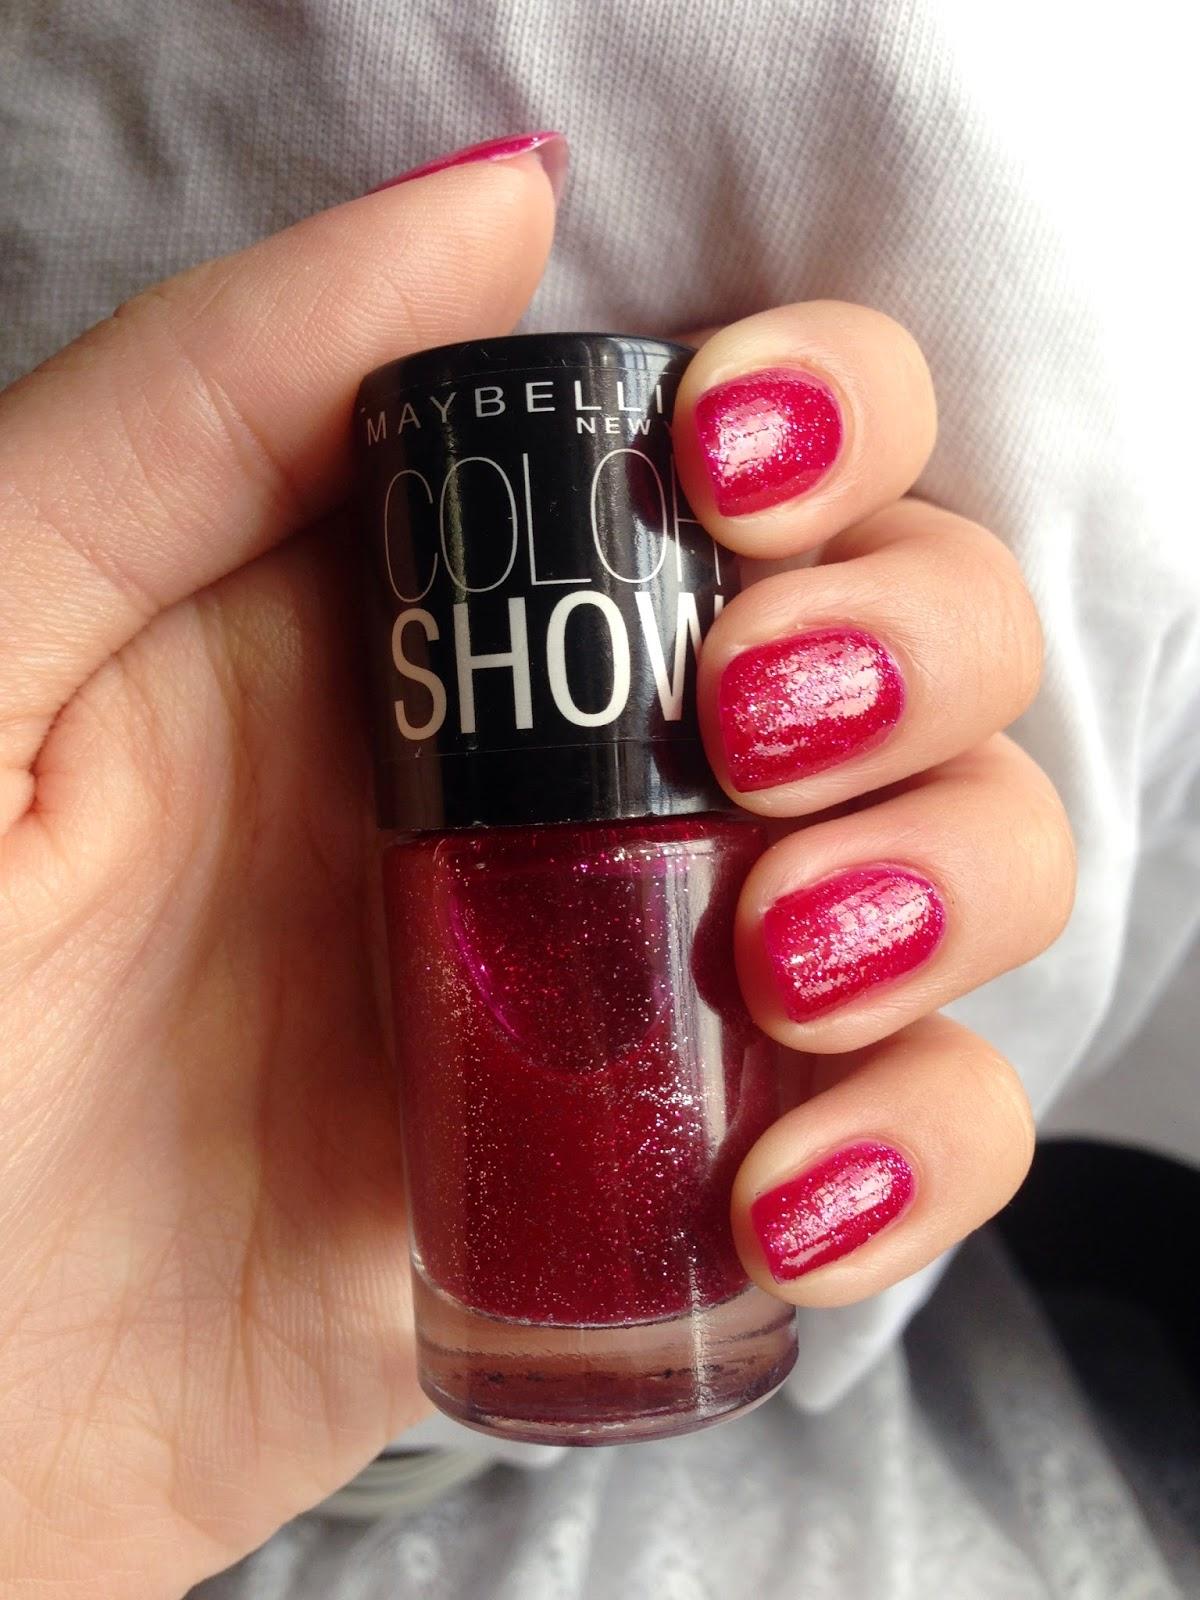 Maybelline Color Show Nail Polishes (II) | H A L F I N C H N A I L S